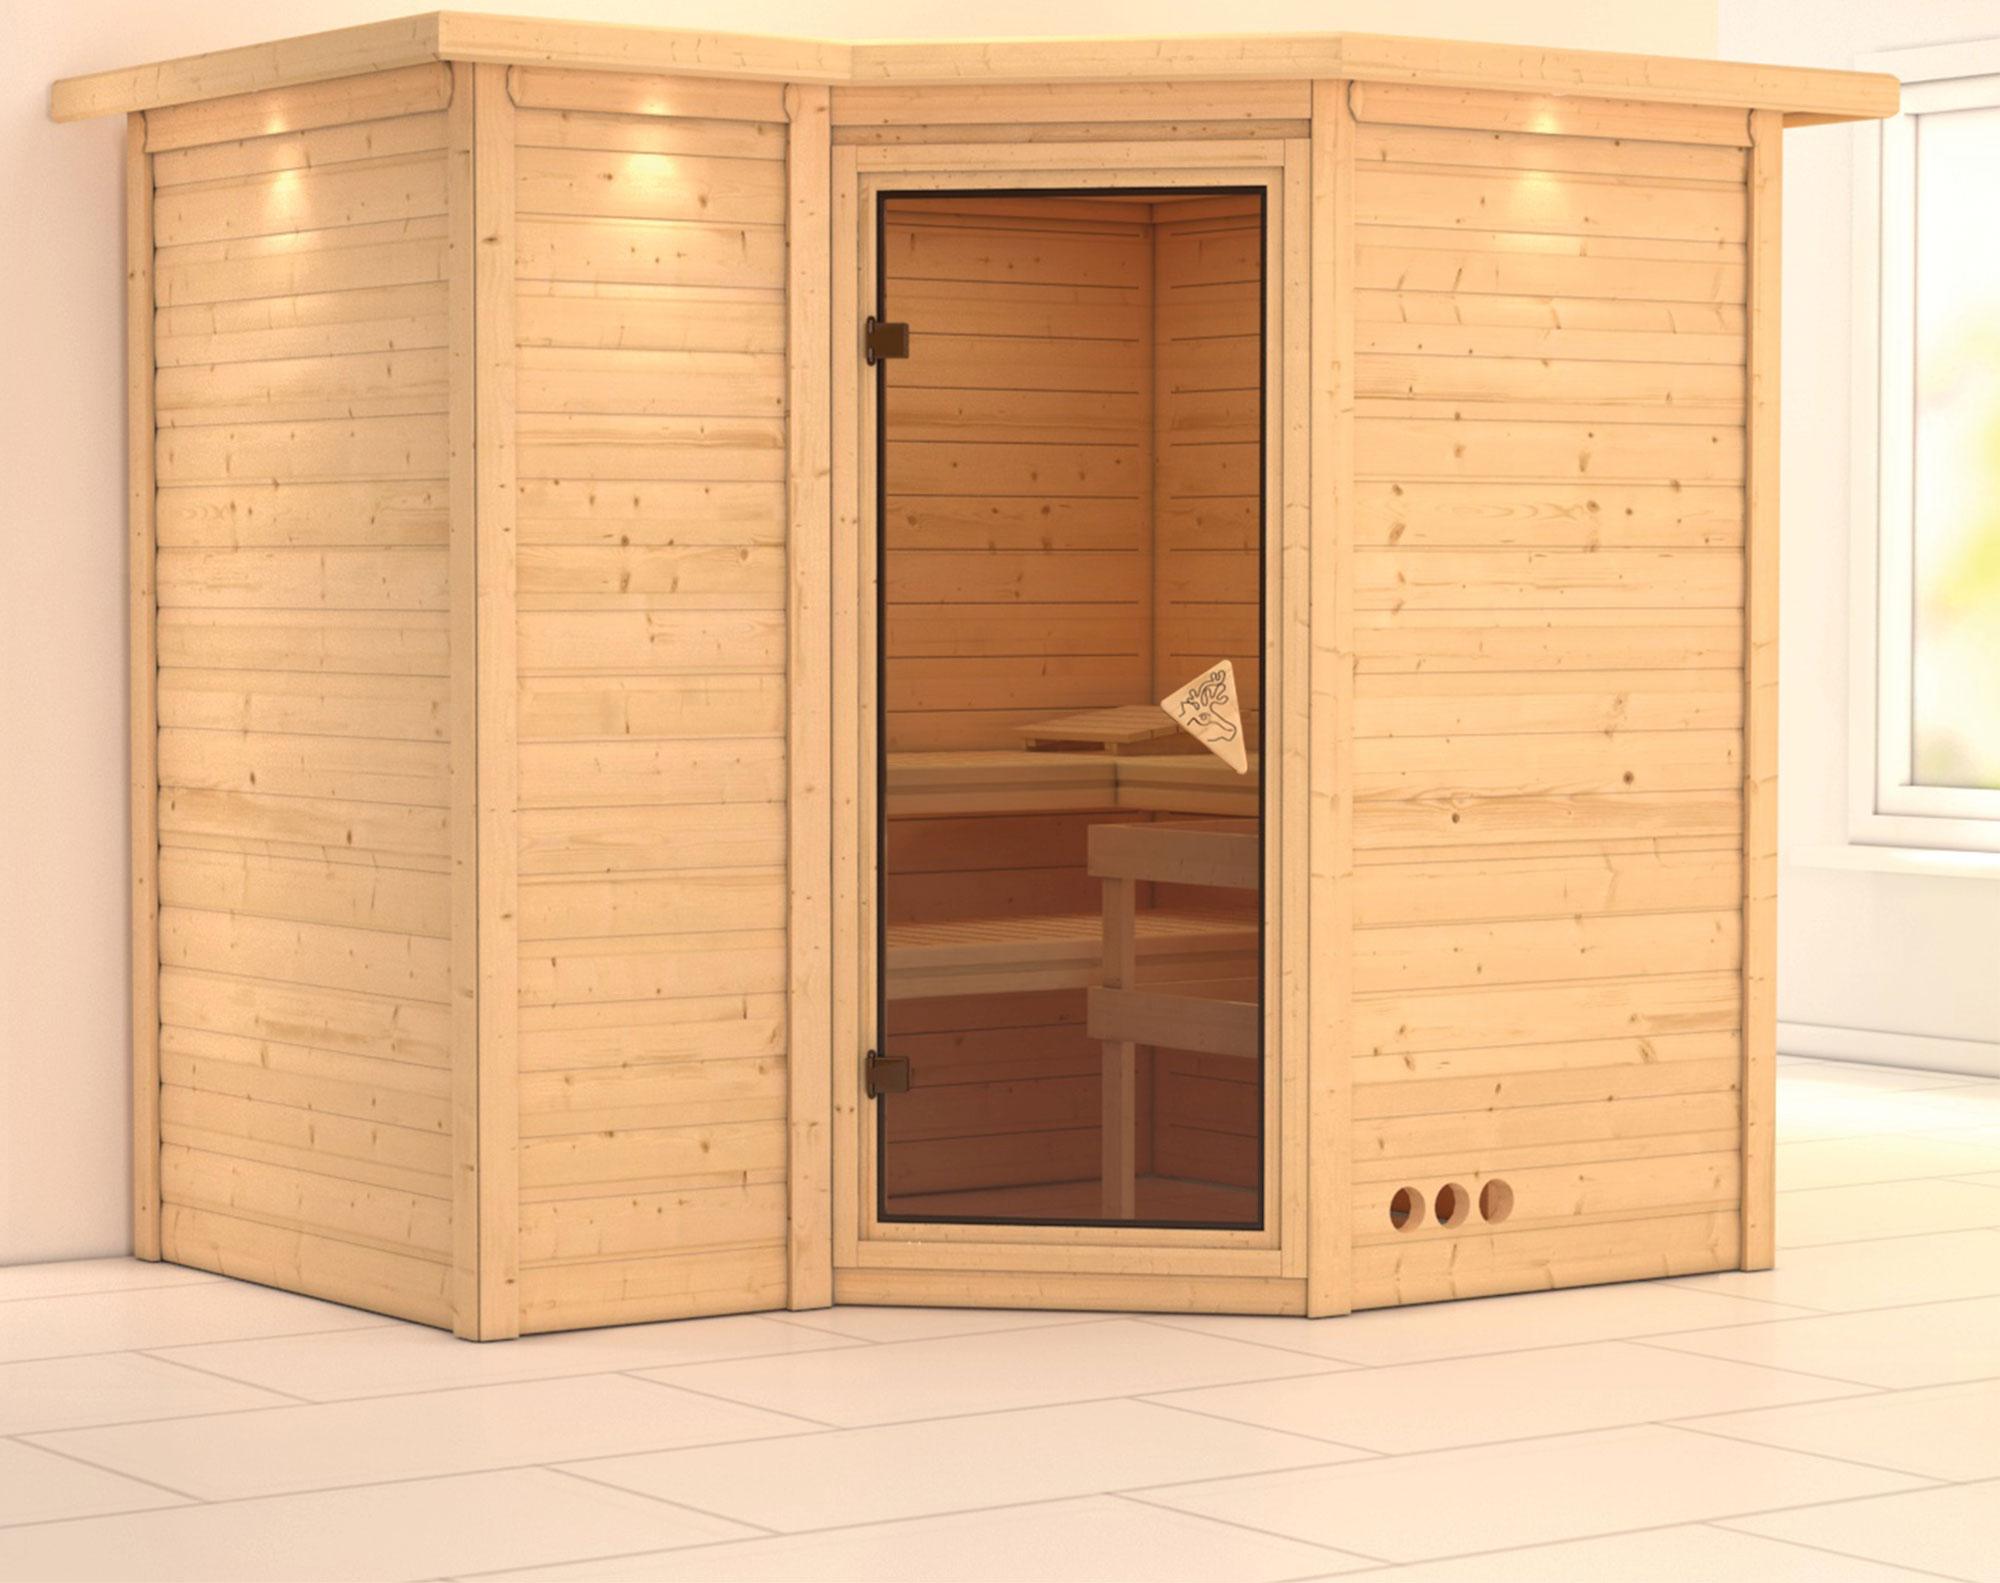 karibu sauna sahib2 40mm dachkranz ohne ofen classic t r. Black Bedroom Furniture Sets. Home Design Ideas